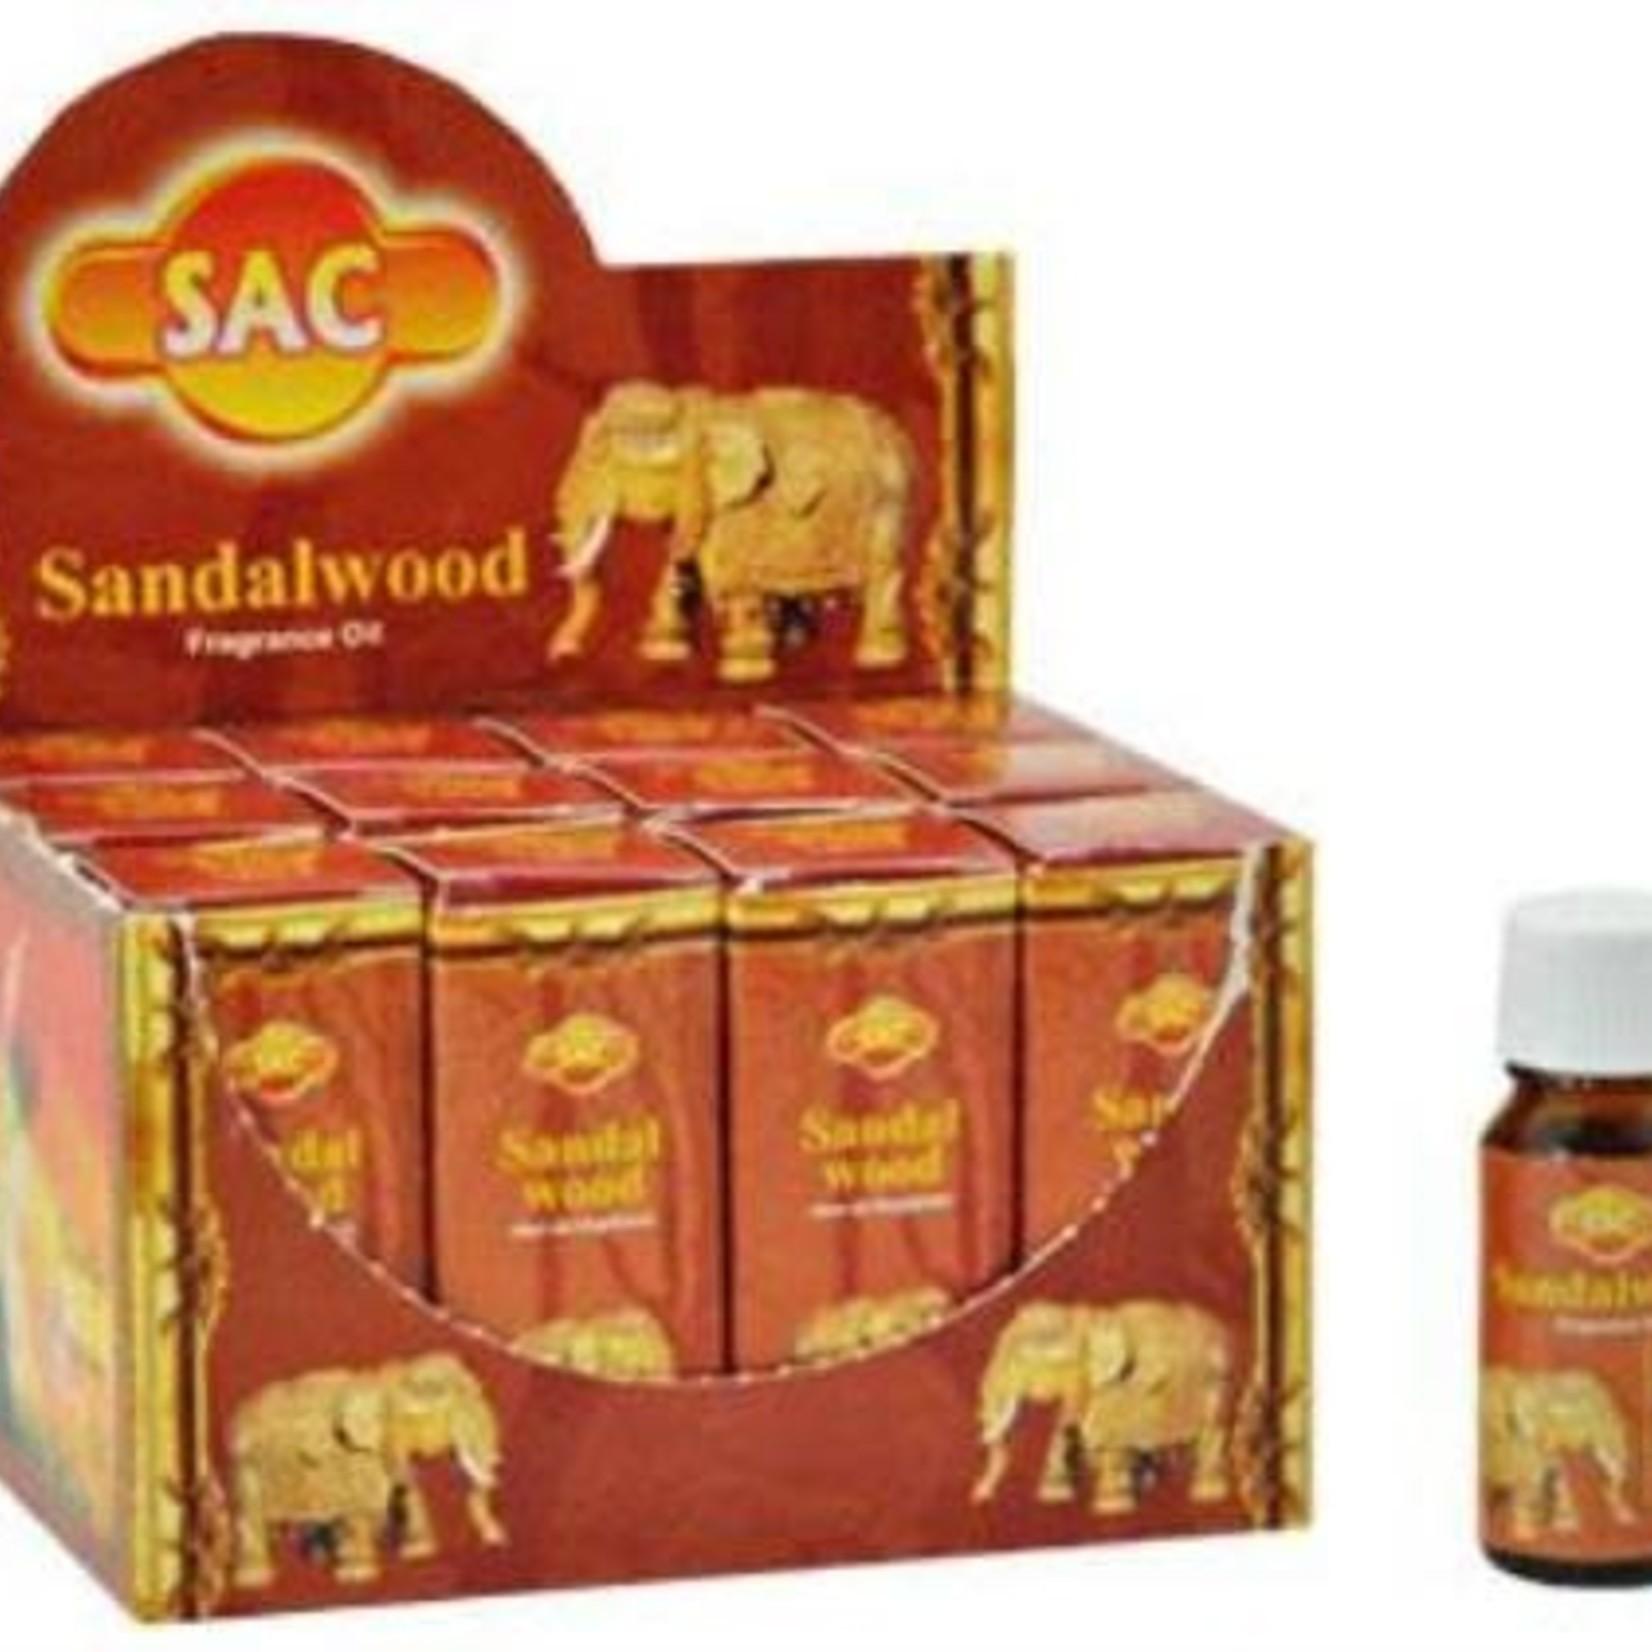 Sandalwood Fragrance Oil SAC